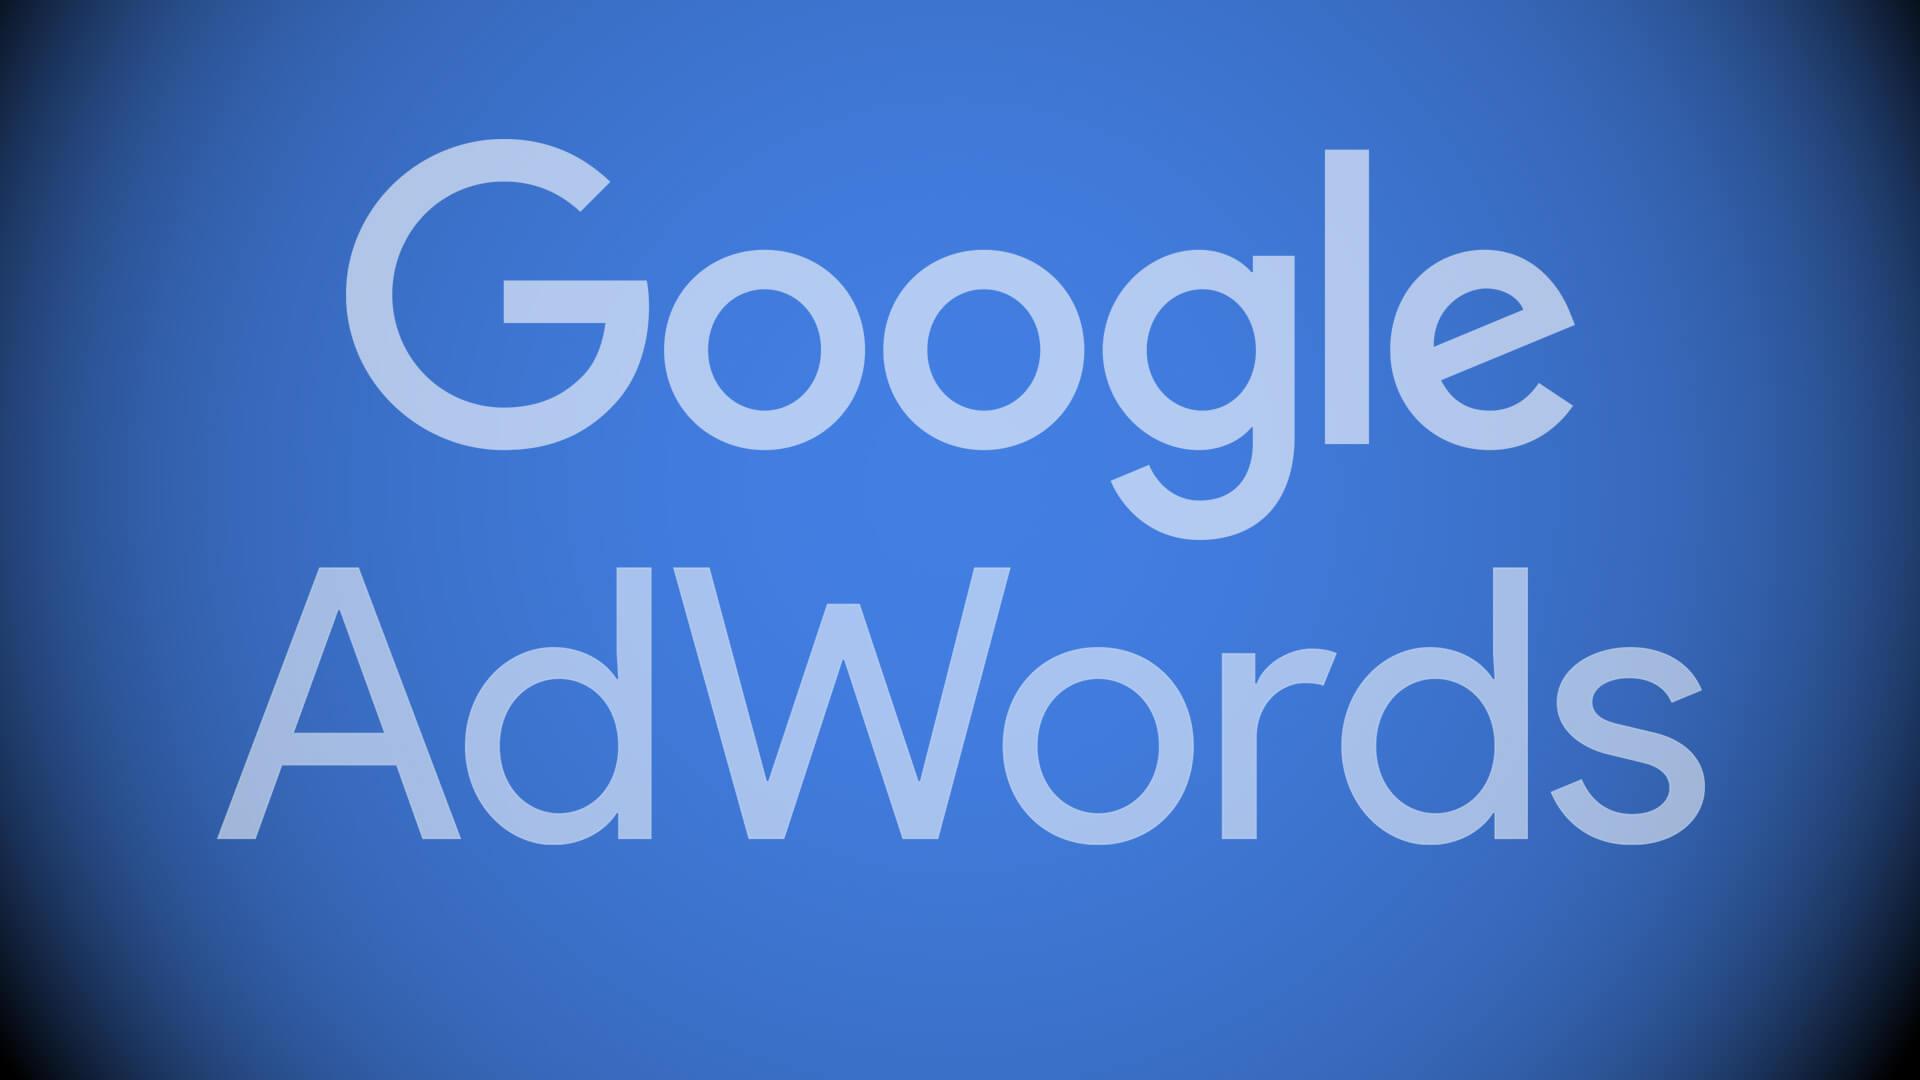 google-adwords-blue1-1920